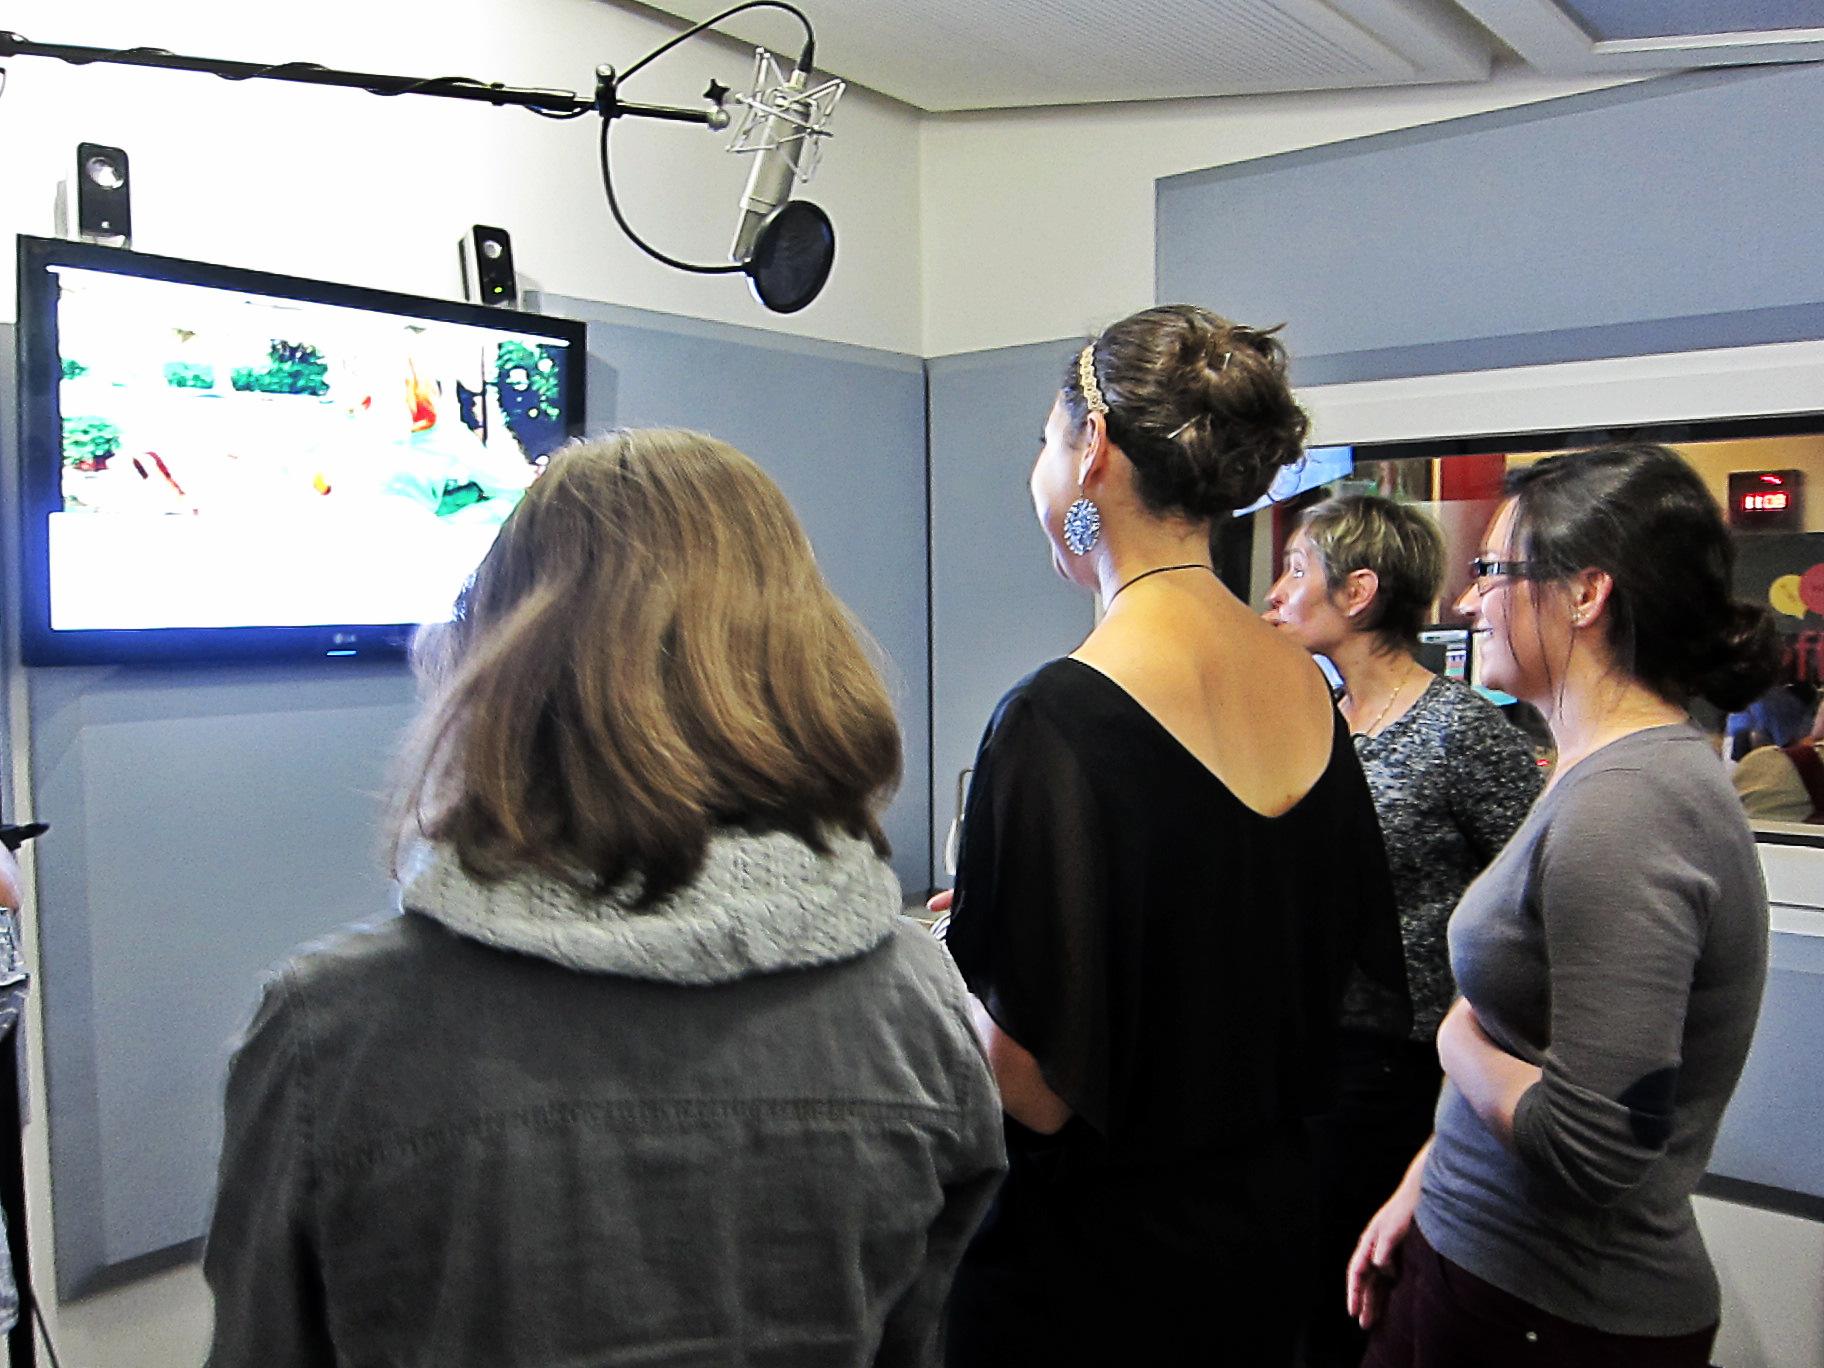 Visite Voix Off Agency VOA CDT 93 Futur en Seine 2014